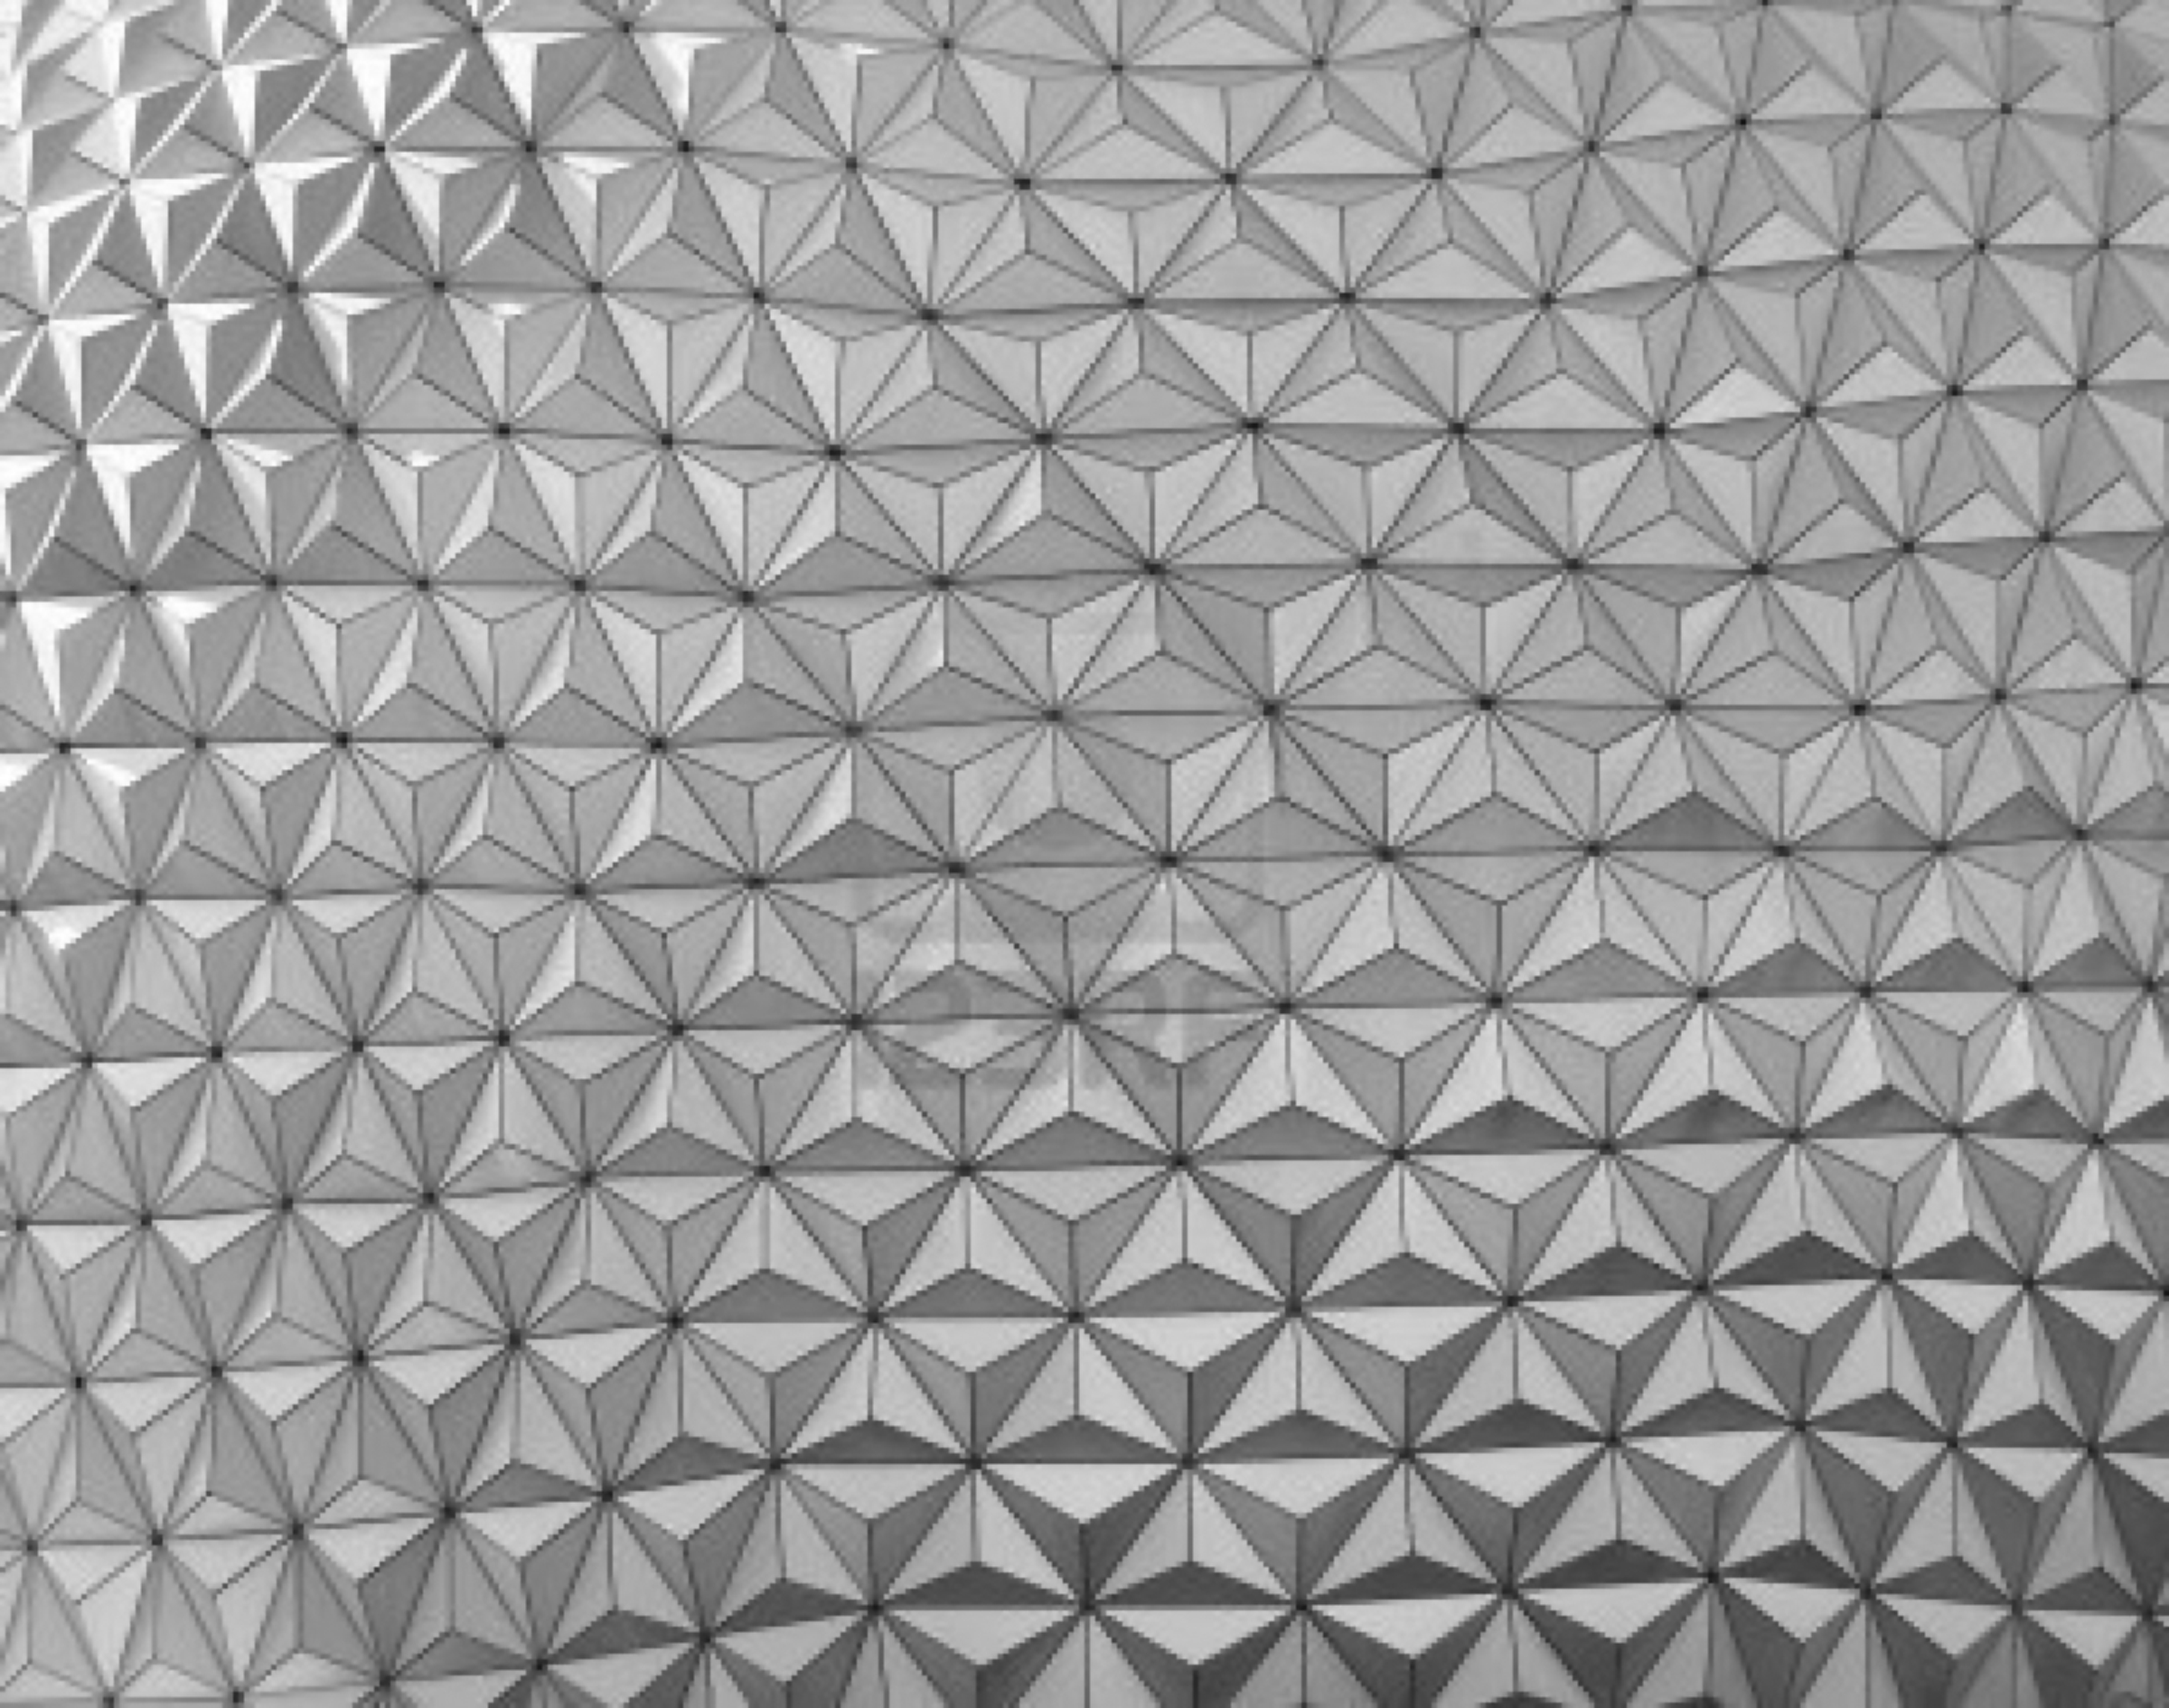 Black And White Home Wallpaper Meditations On Buckminster Fuller And The Sacred Geometry